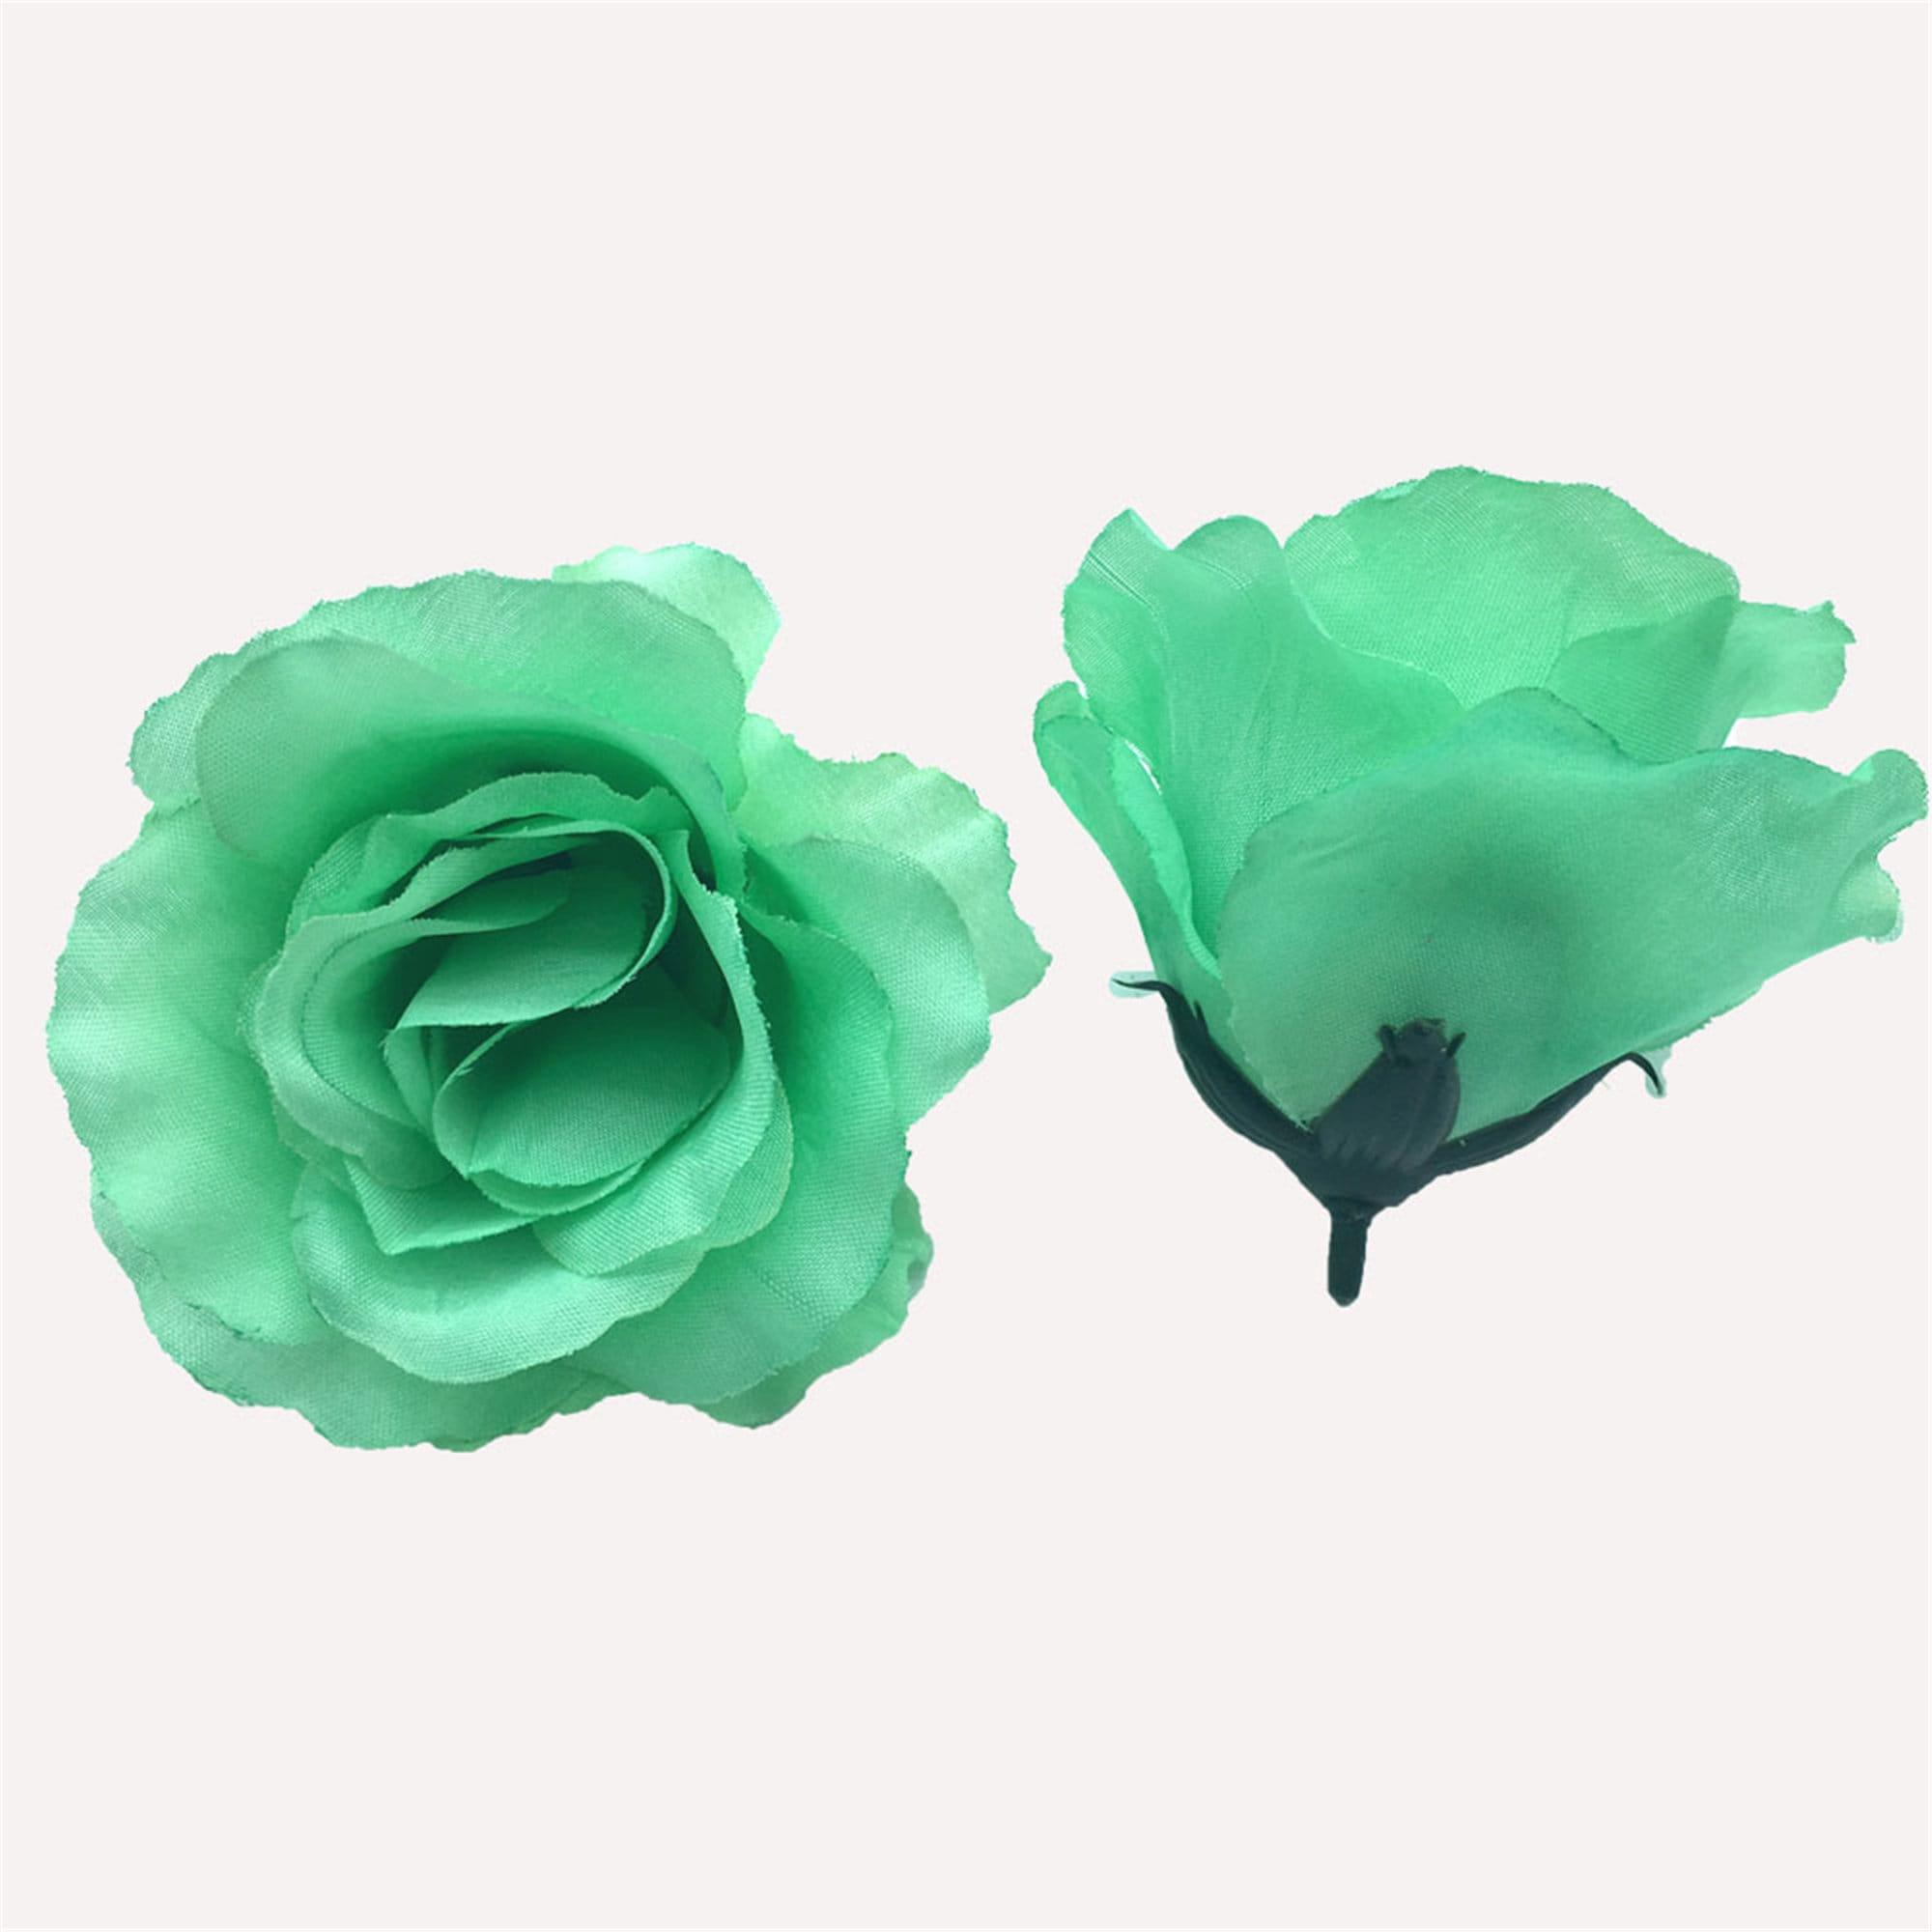 50//100pcs Artificial Fake Flower Silk Rose Heads Bulk Wedding Party Home Decor